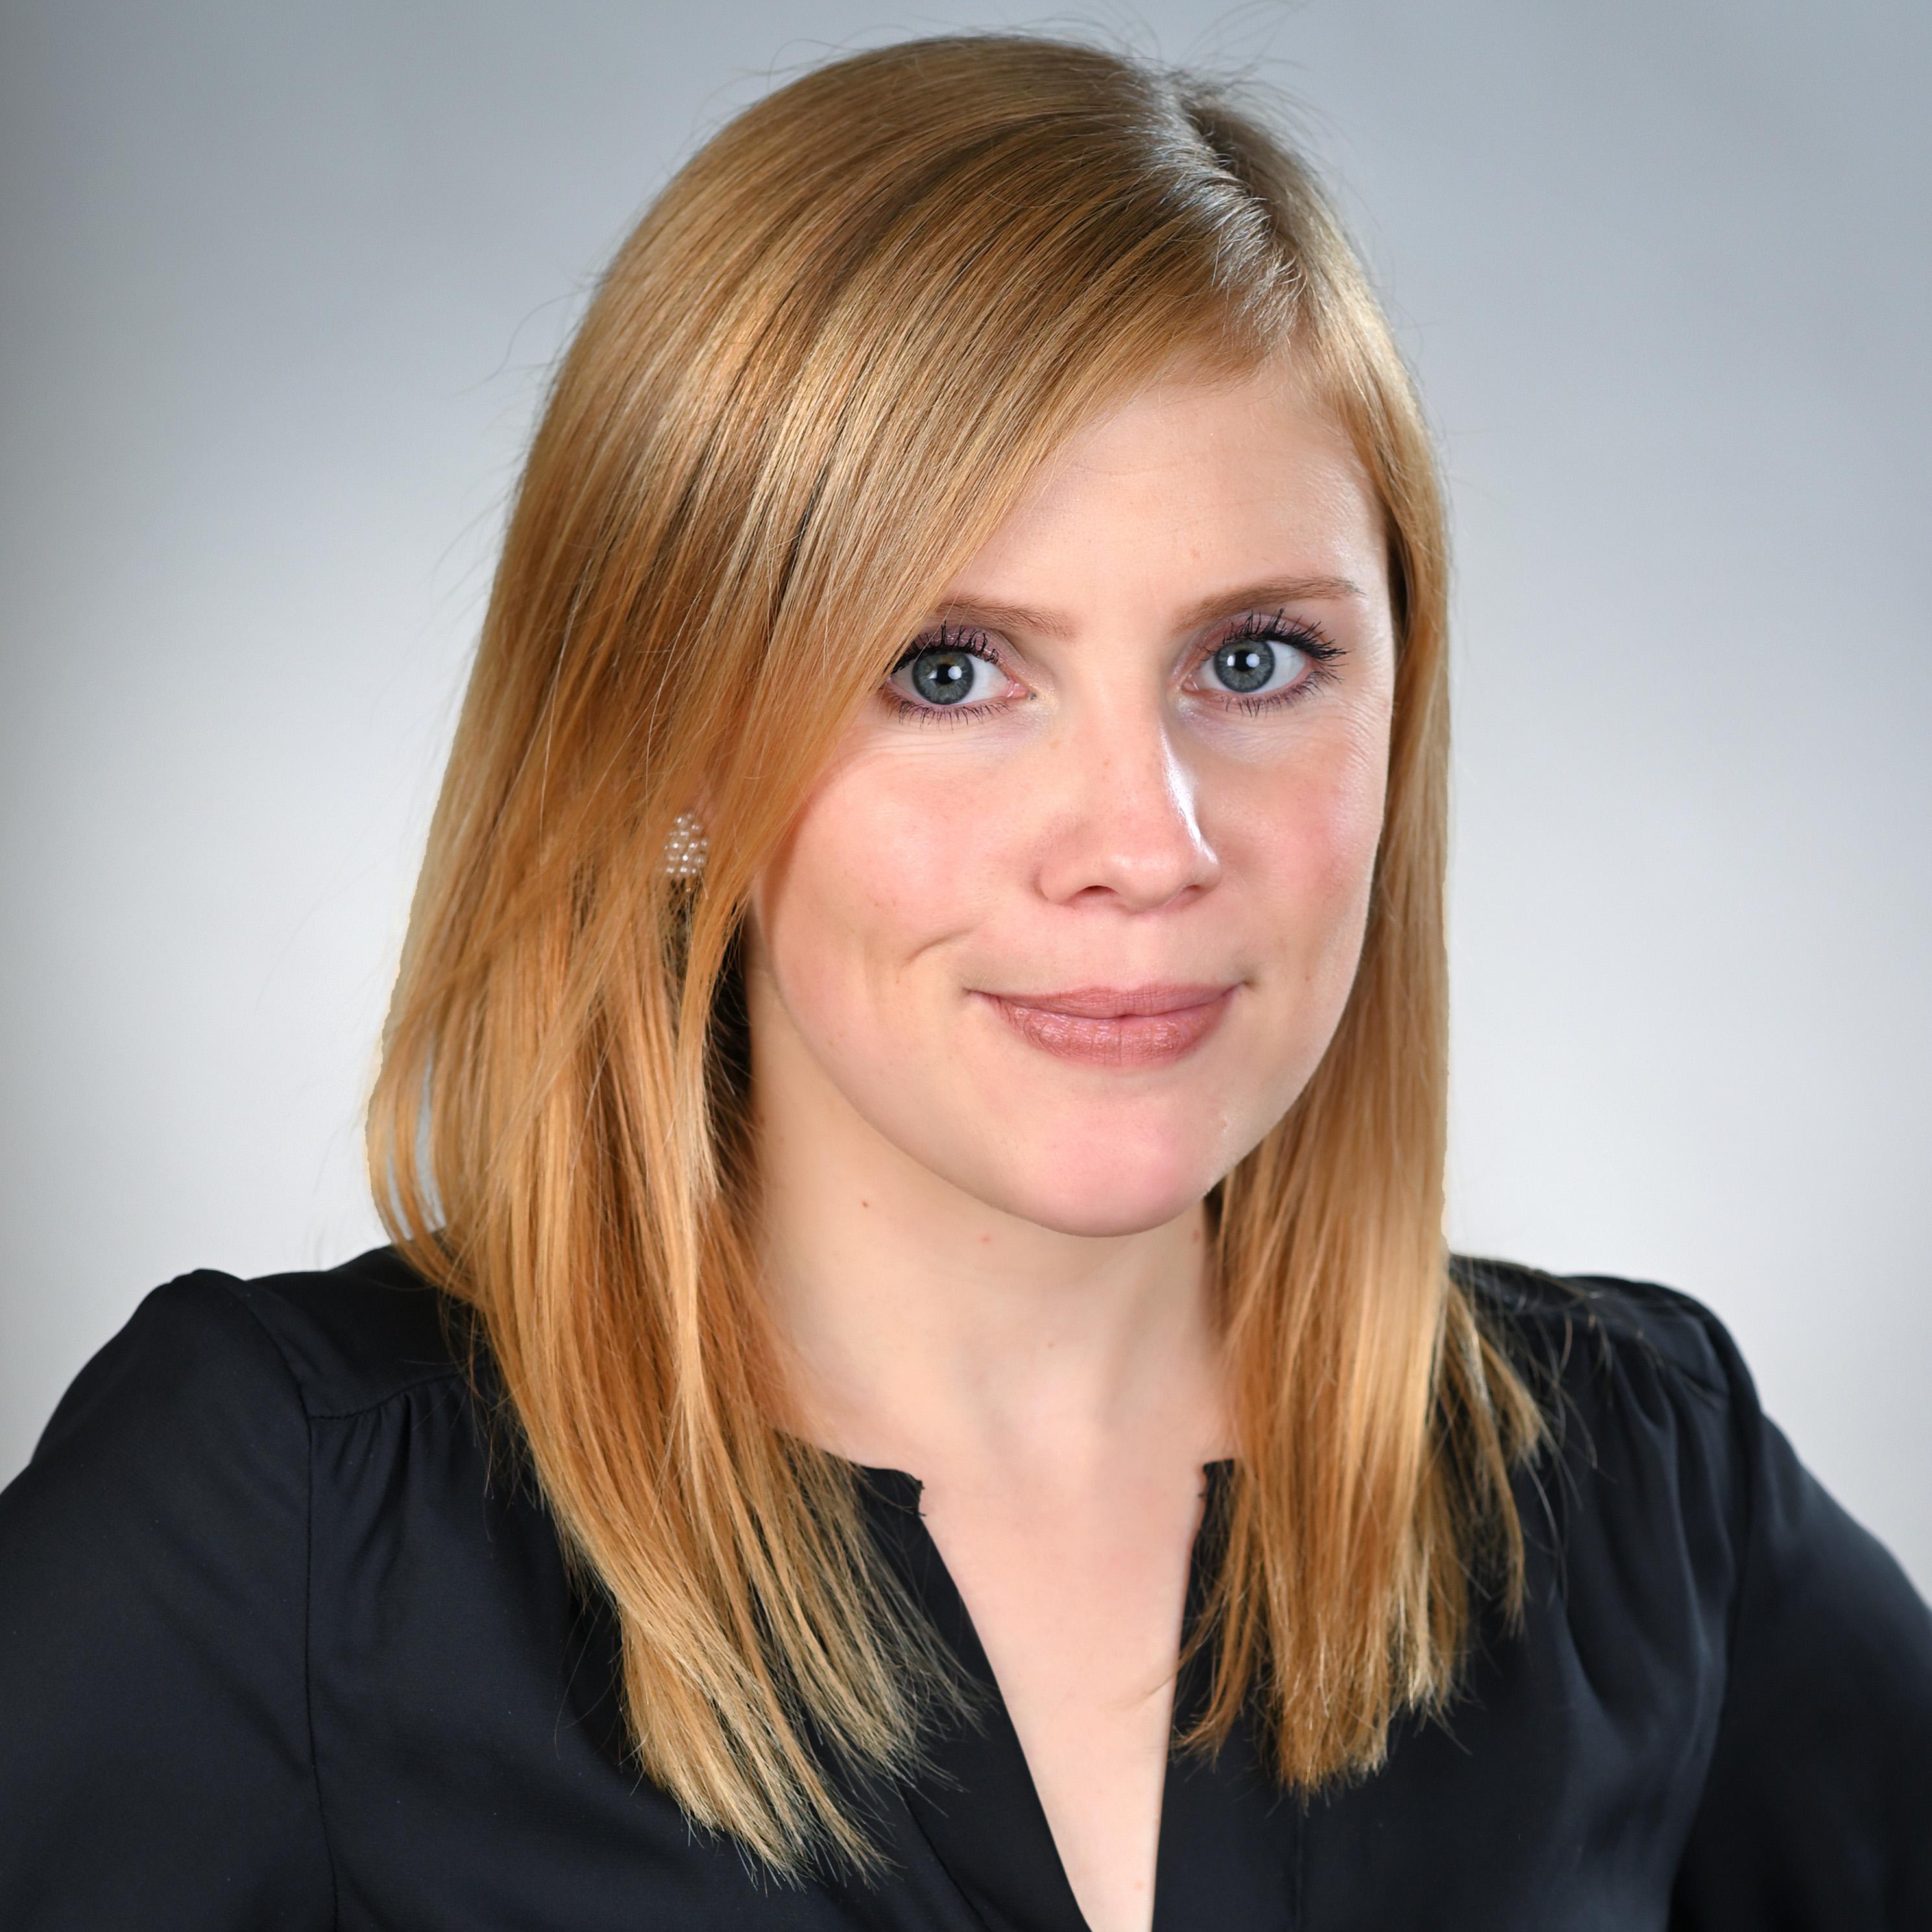 Christina Maria Schwaiger